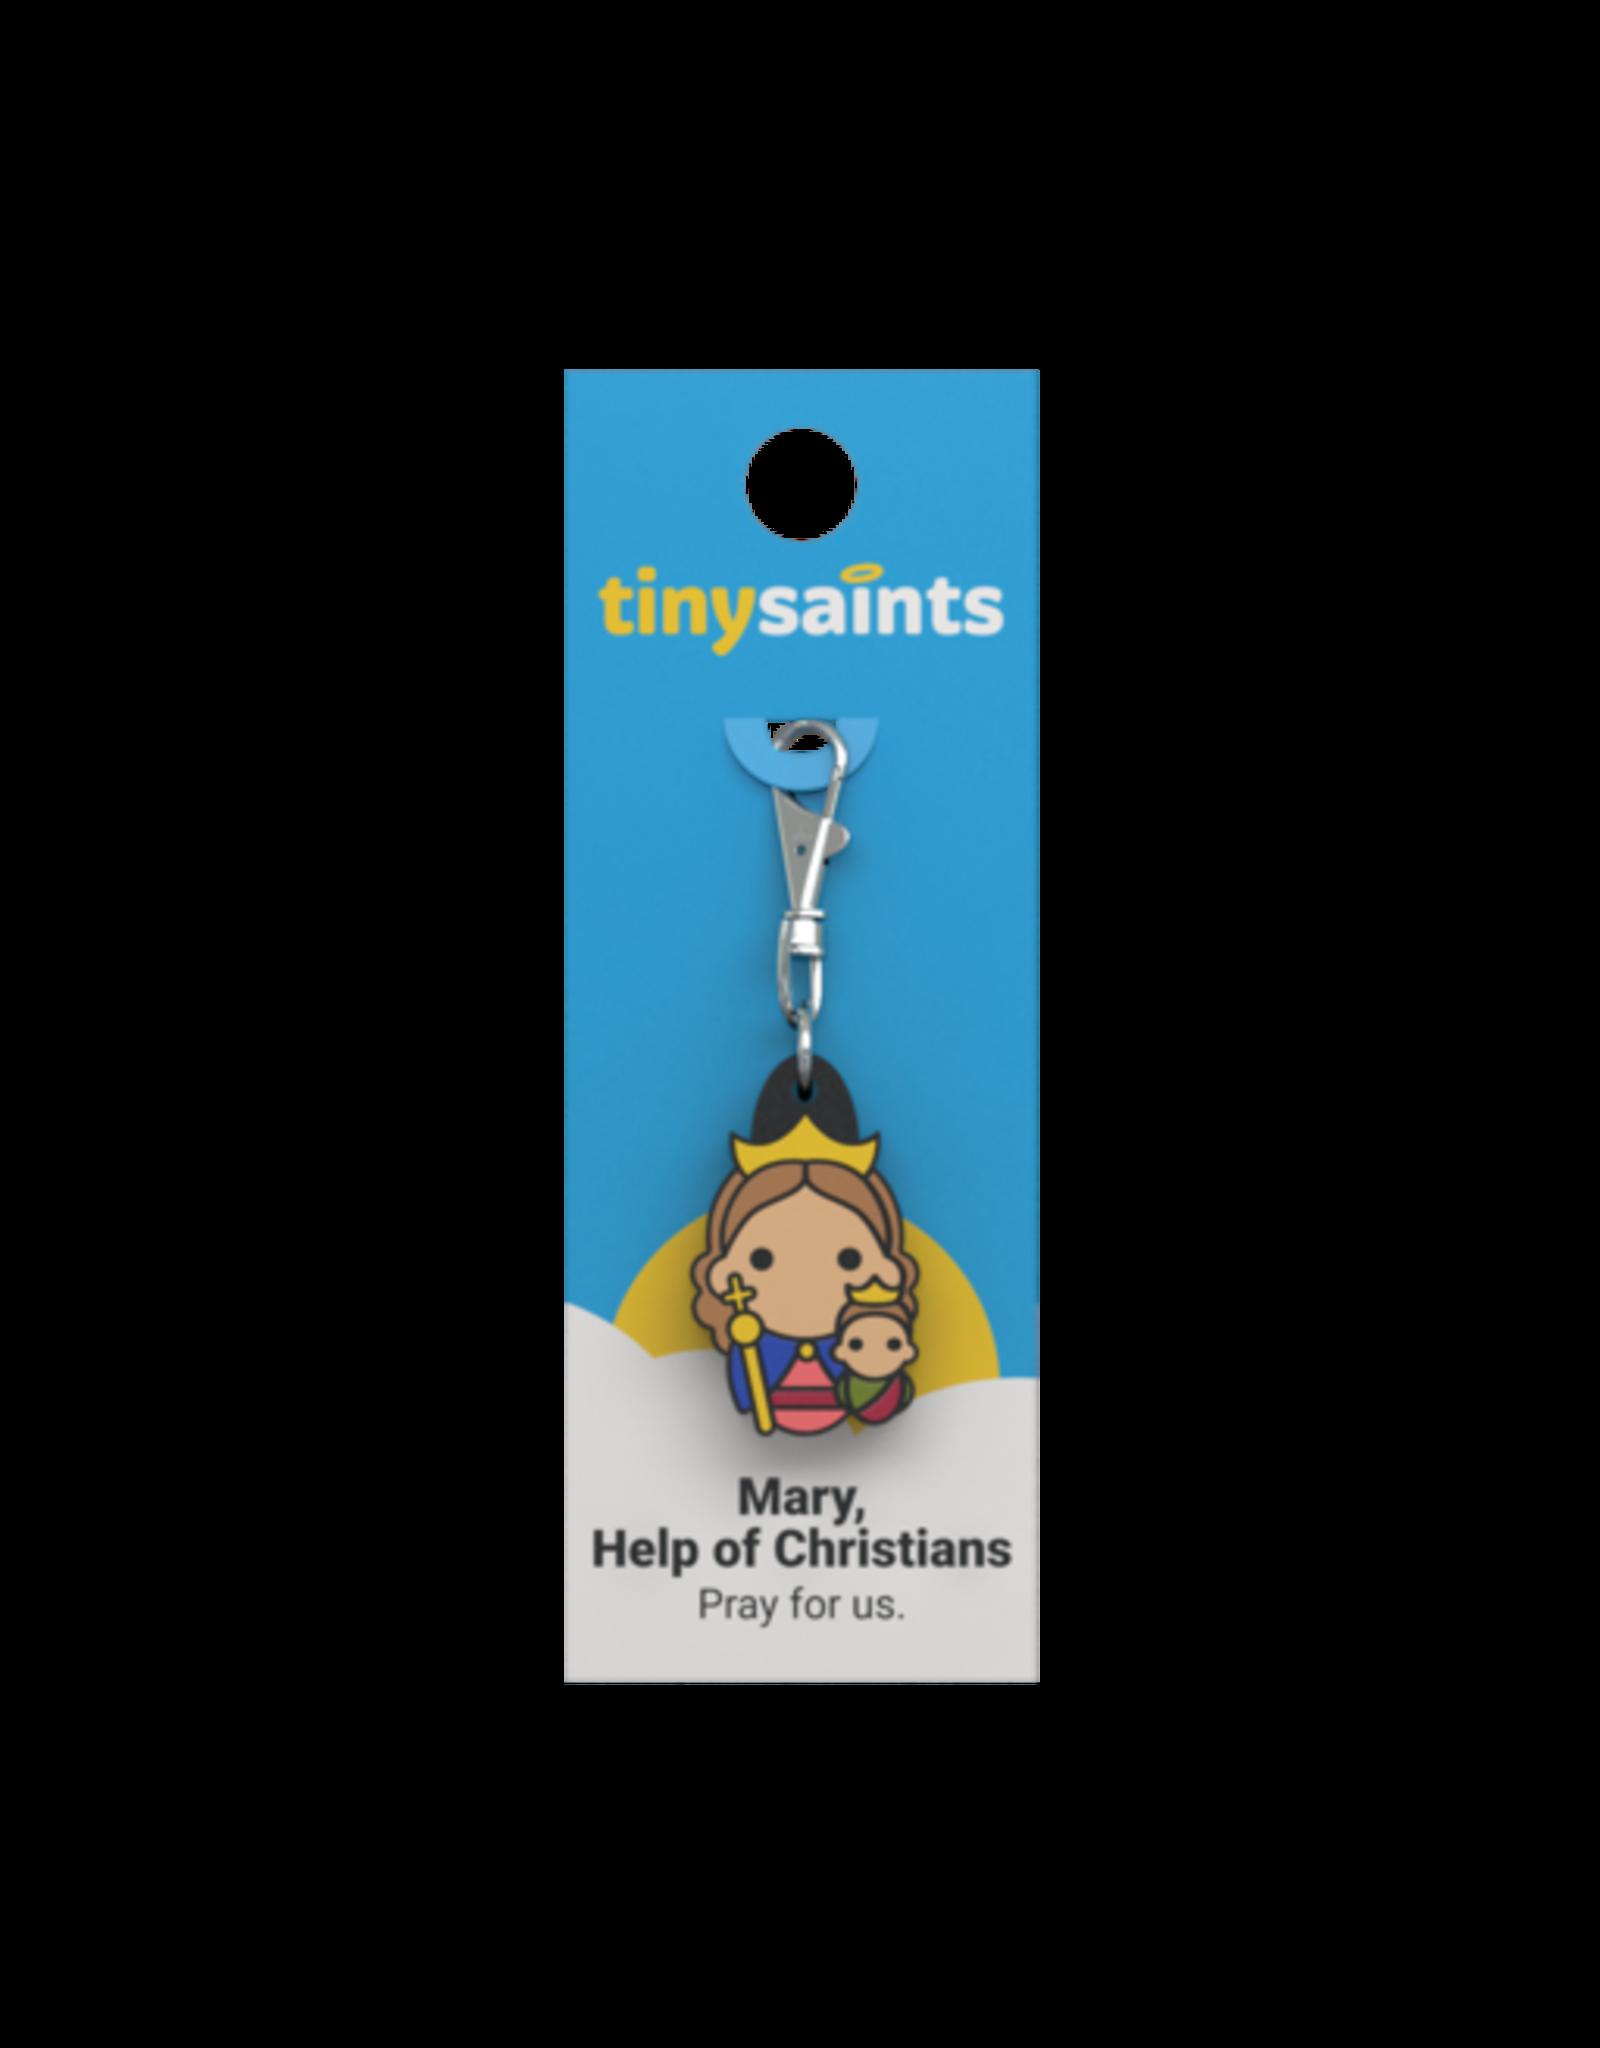 Tiny Saints Tiny Saints Charm - Mary, Help of Christians